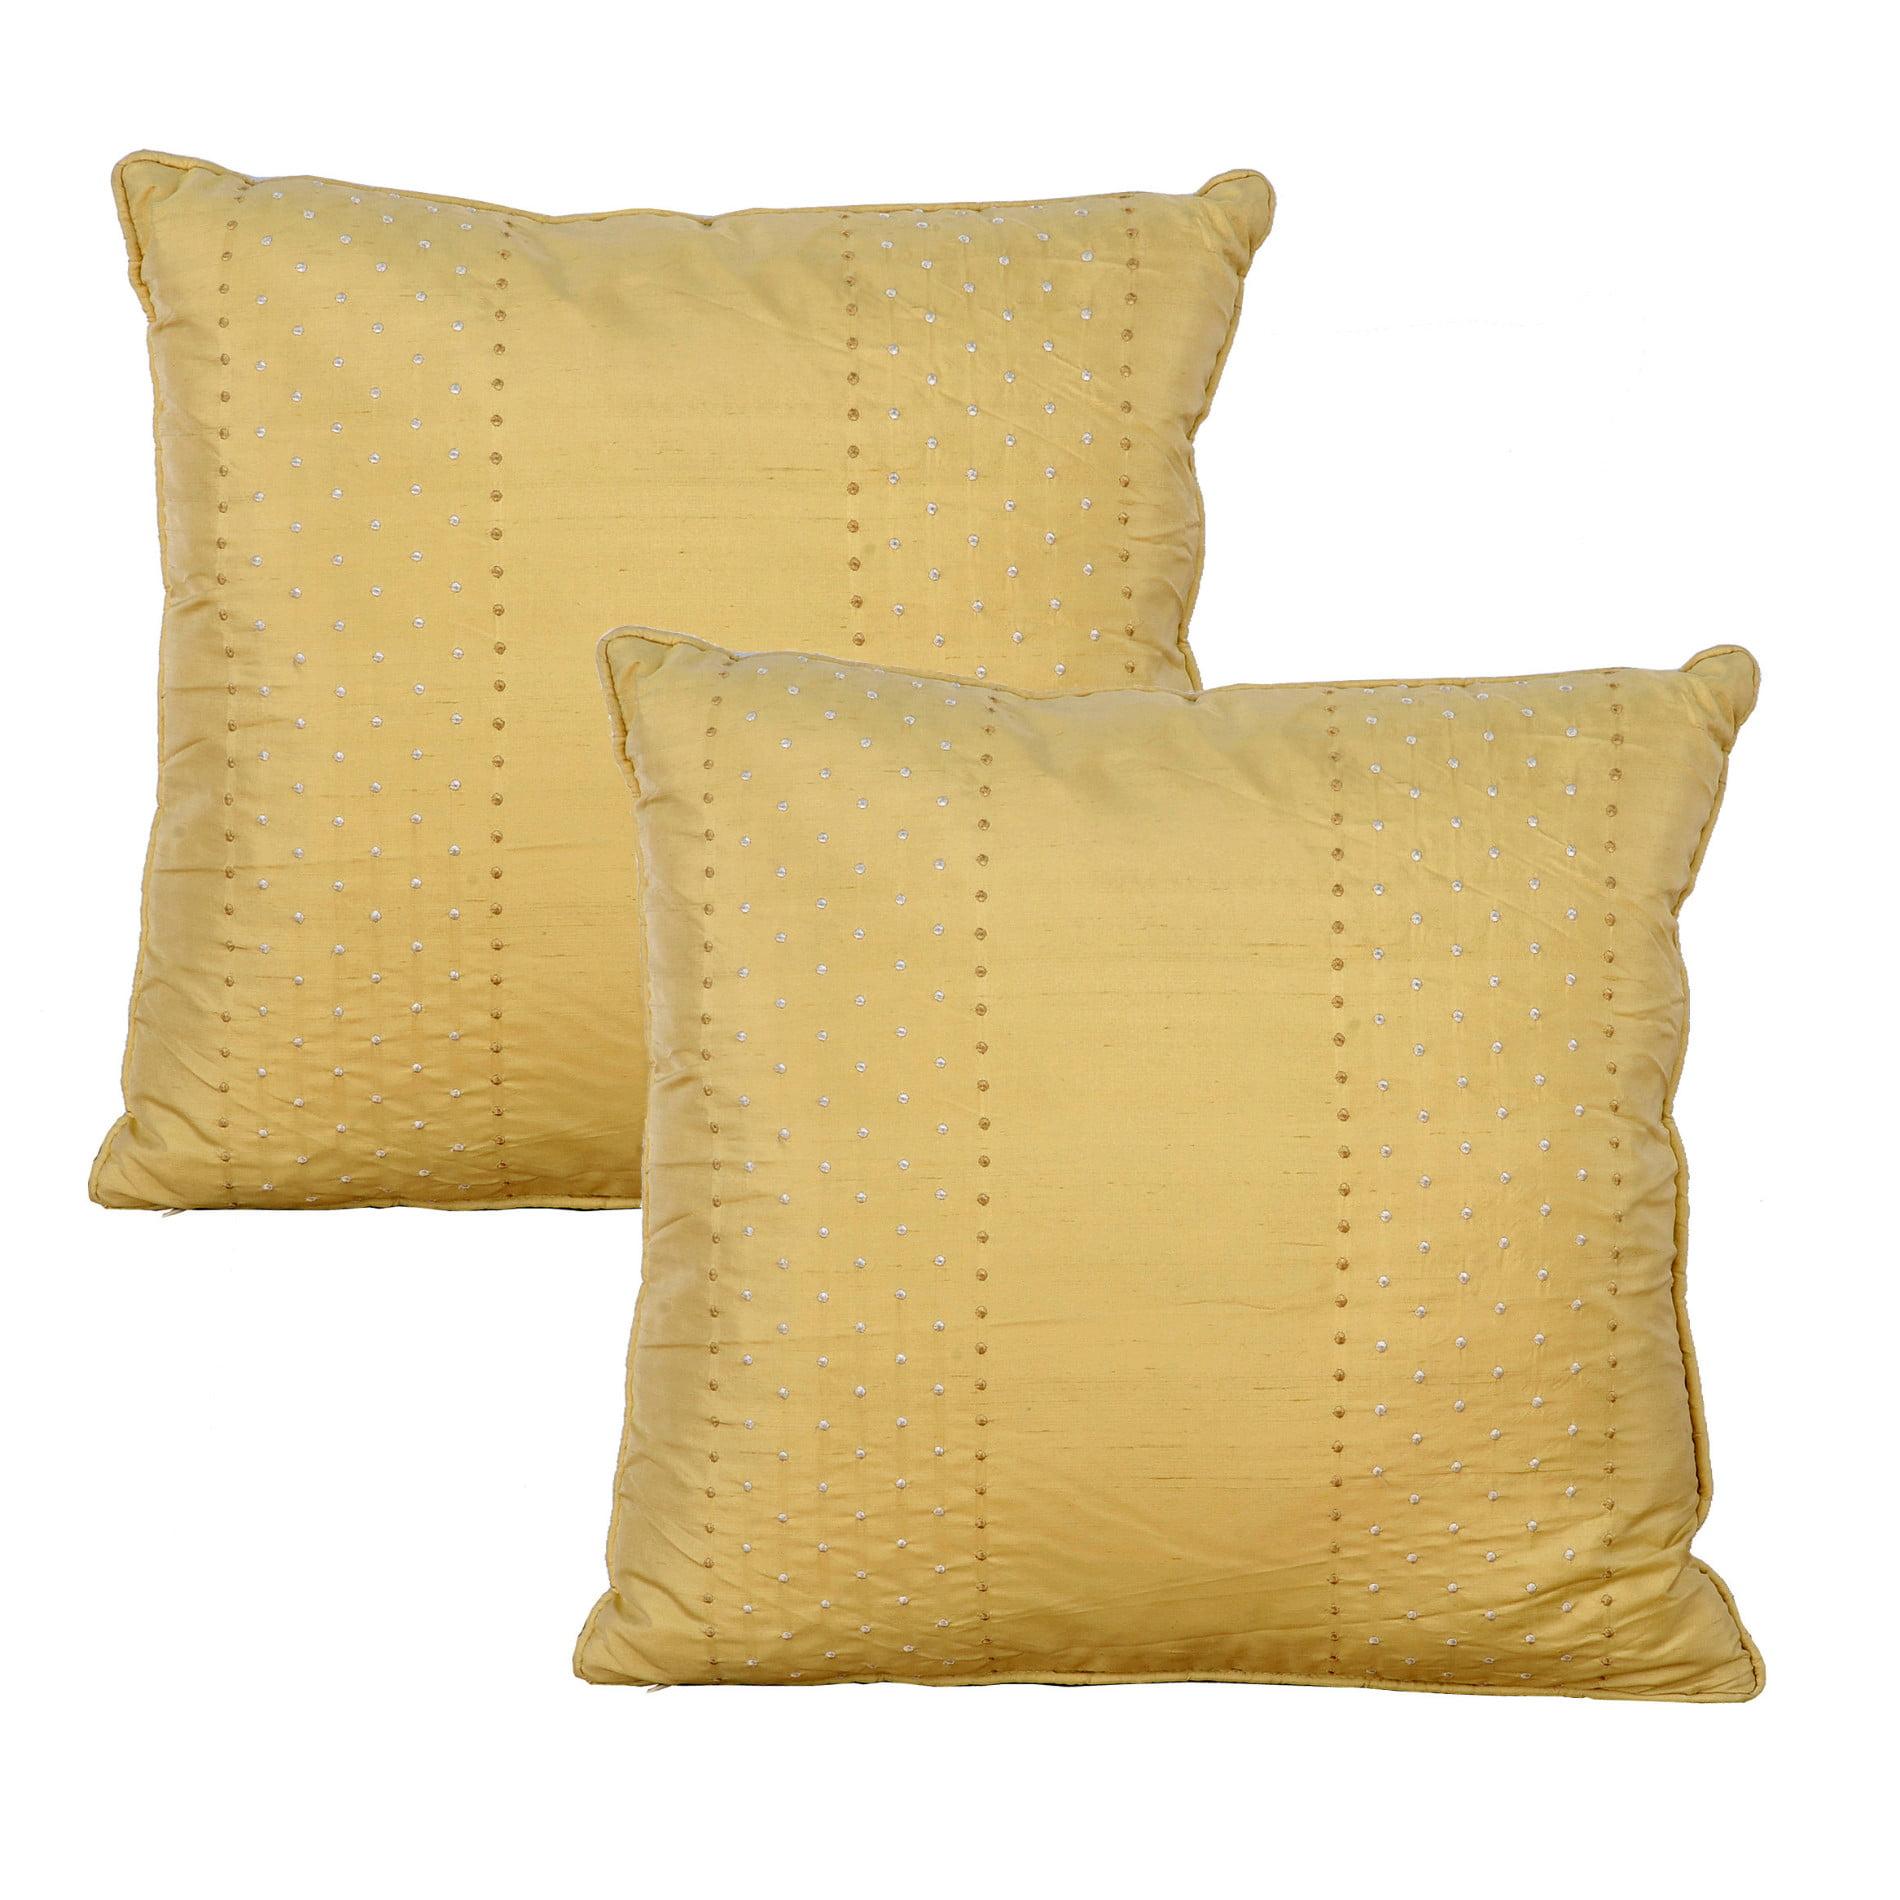 Serenta Marquesa Dot 2 Piece Embroidery Silk Filled Pillow Set